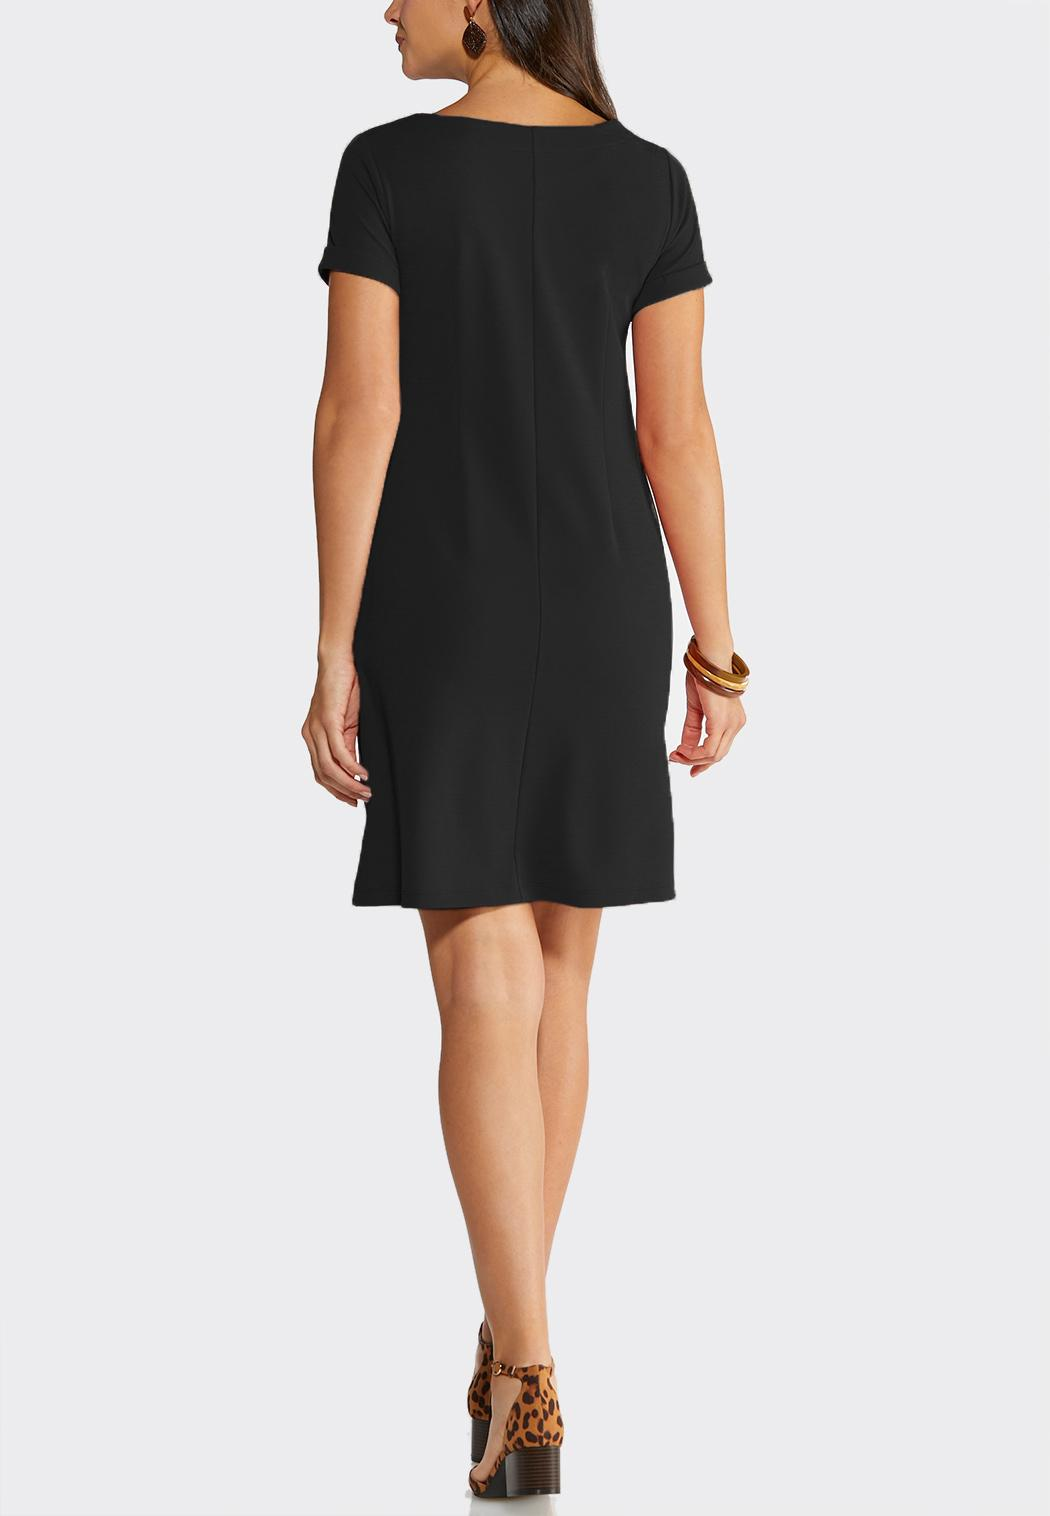 A-Line Button Dress (Item #43919154)